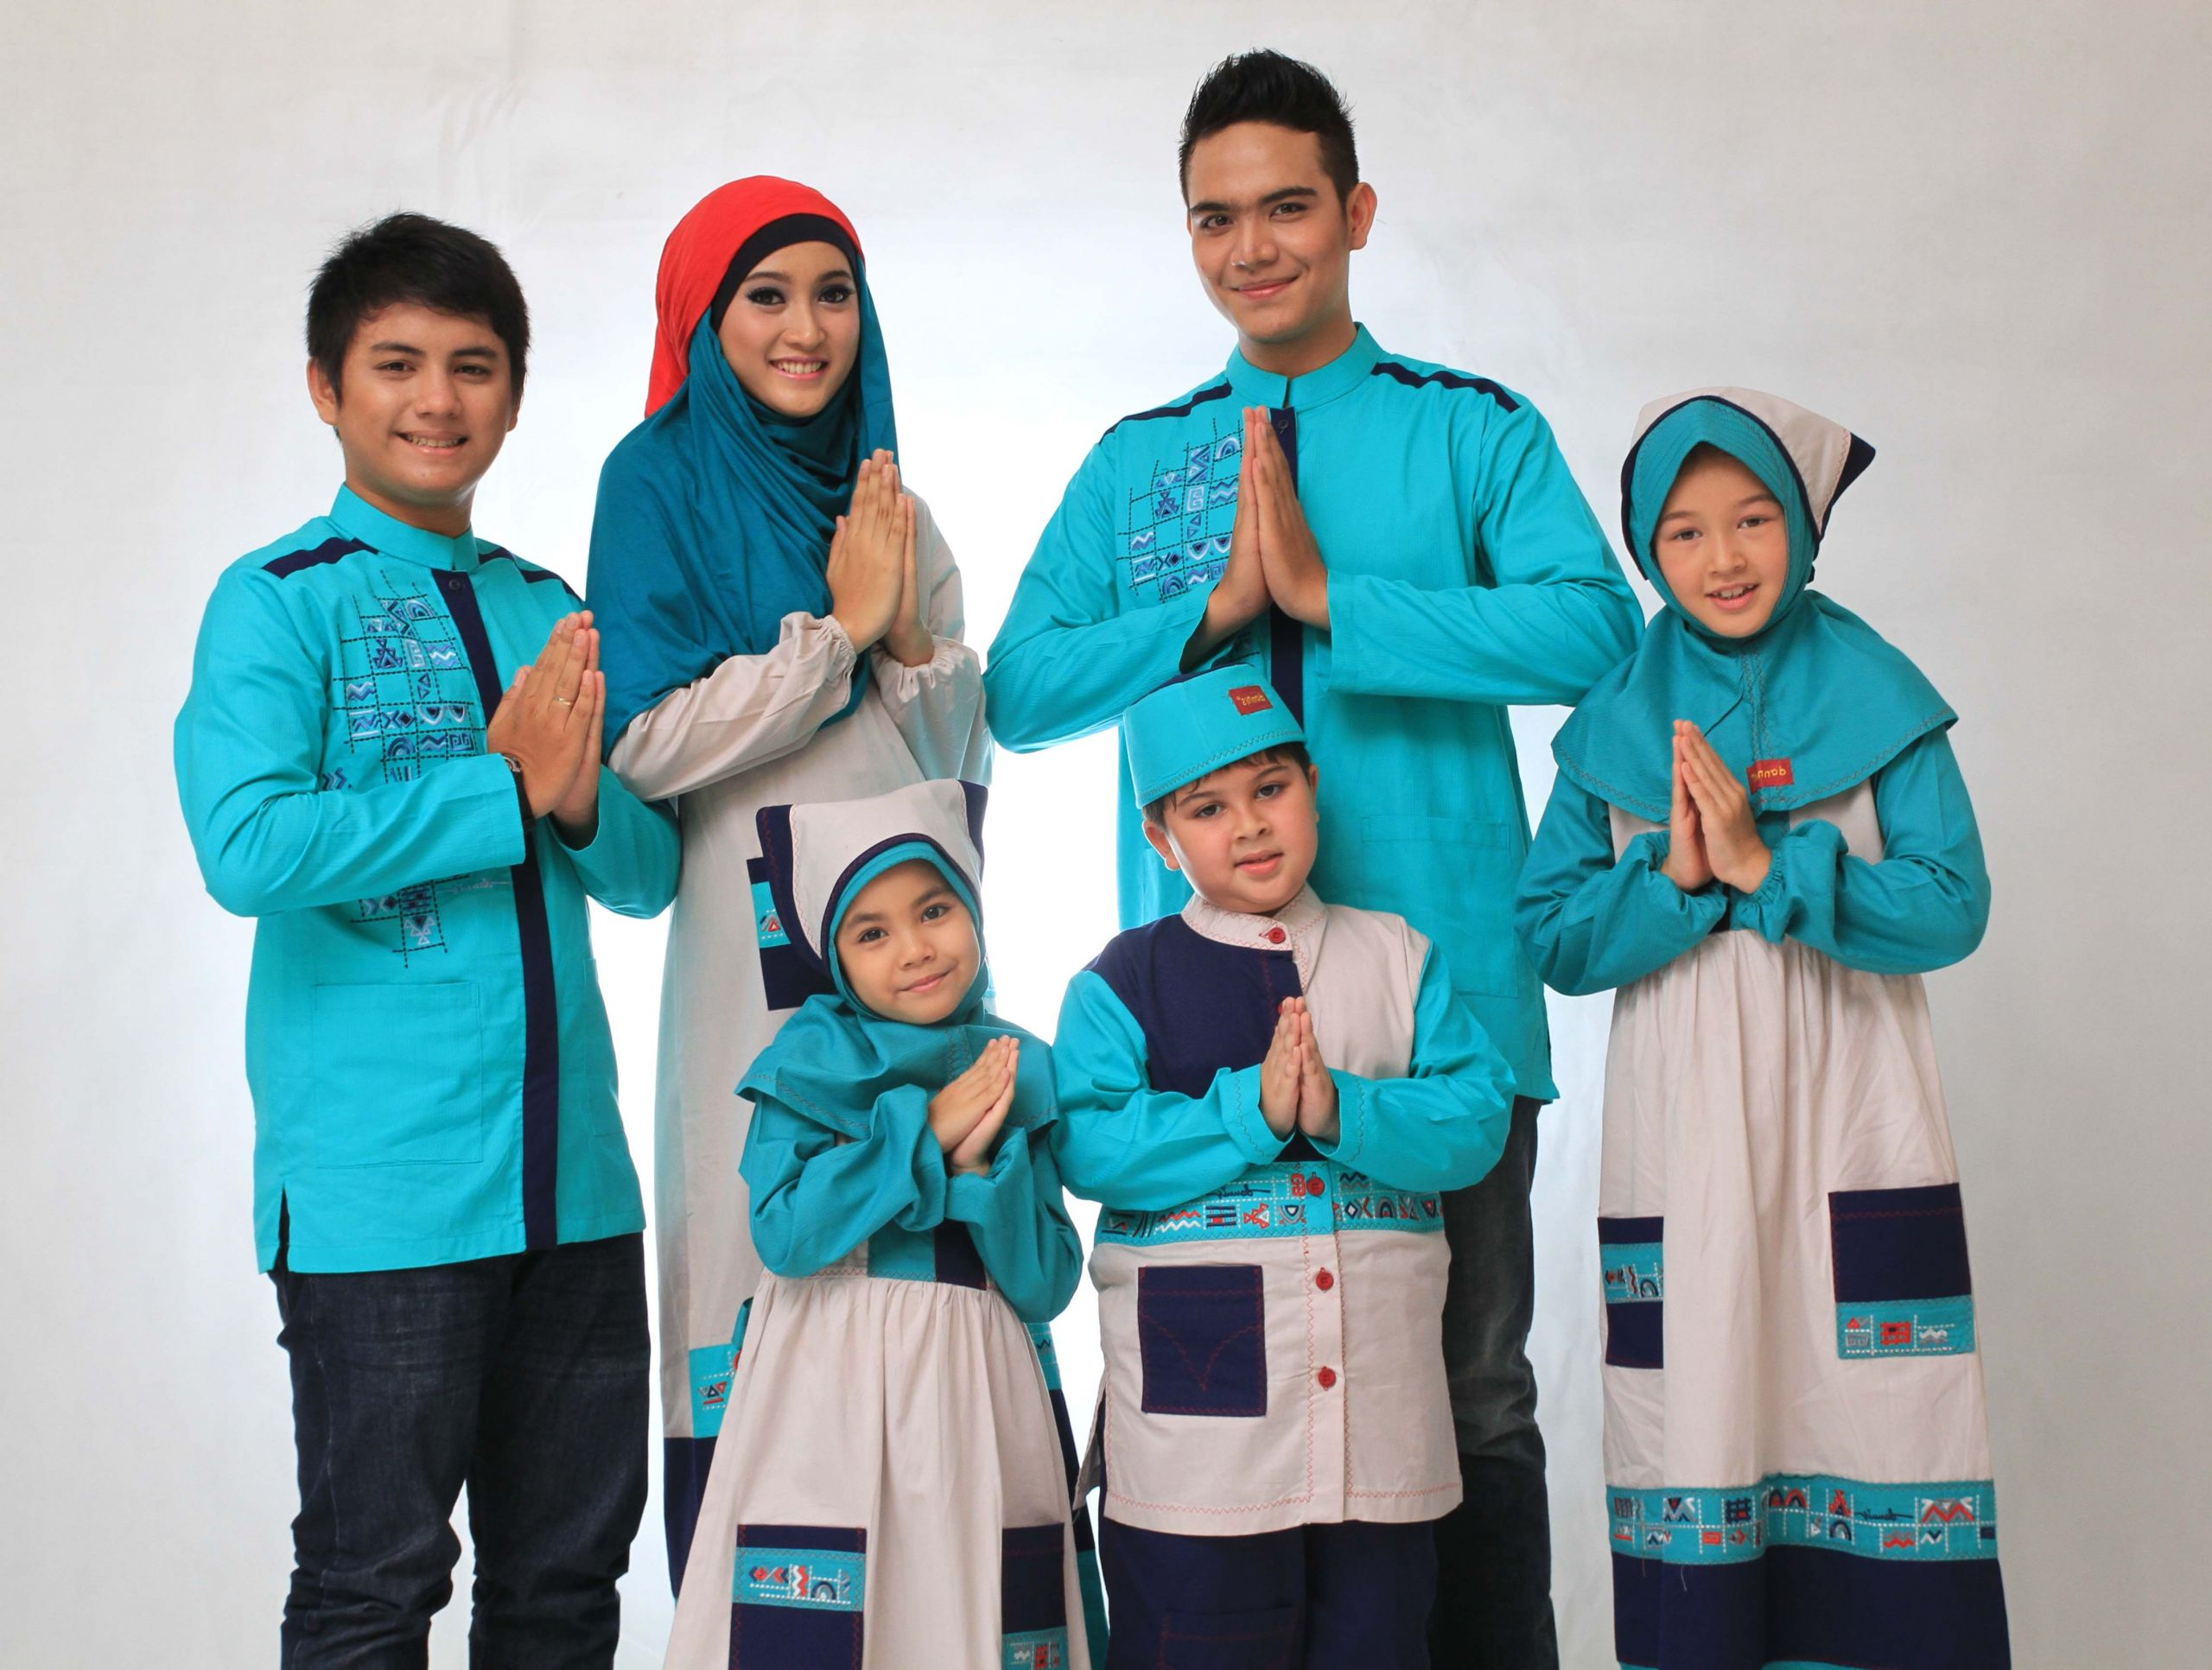 Ide Foto Baju Lebaran Terbaru Budm Baju Muslim Untuk Lebaran Berhijab